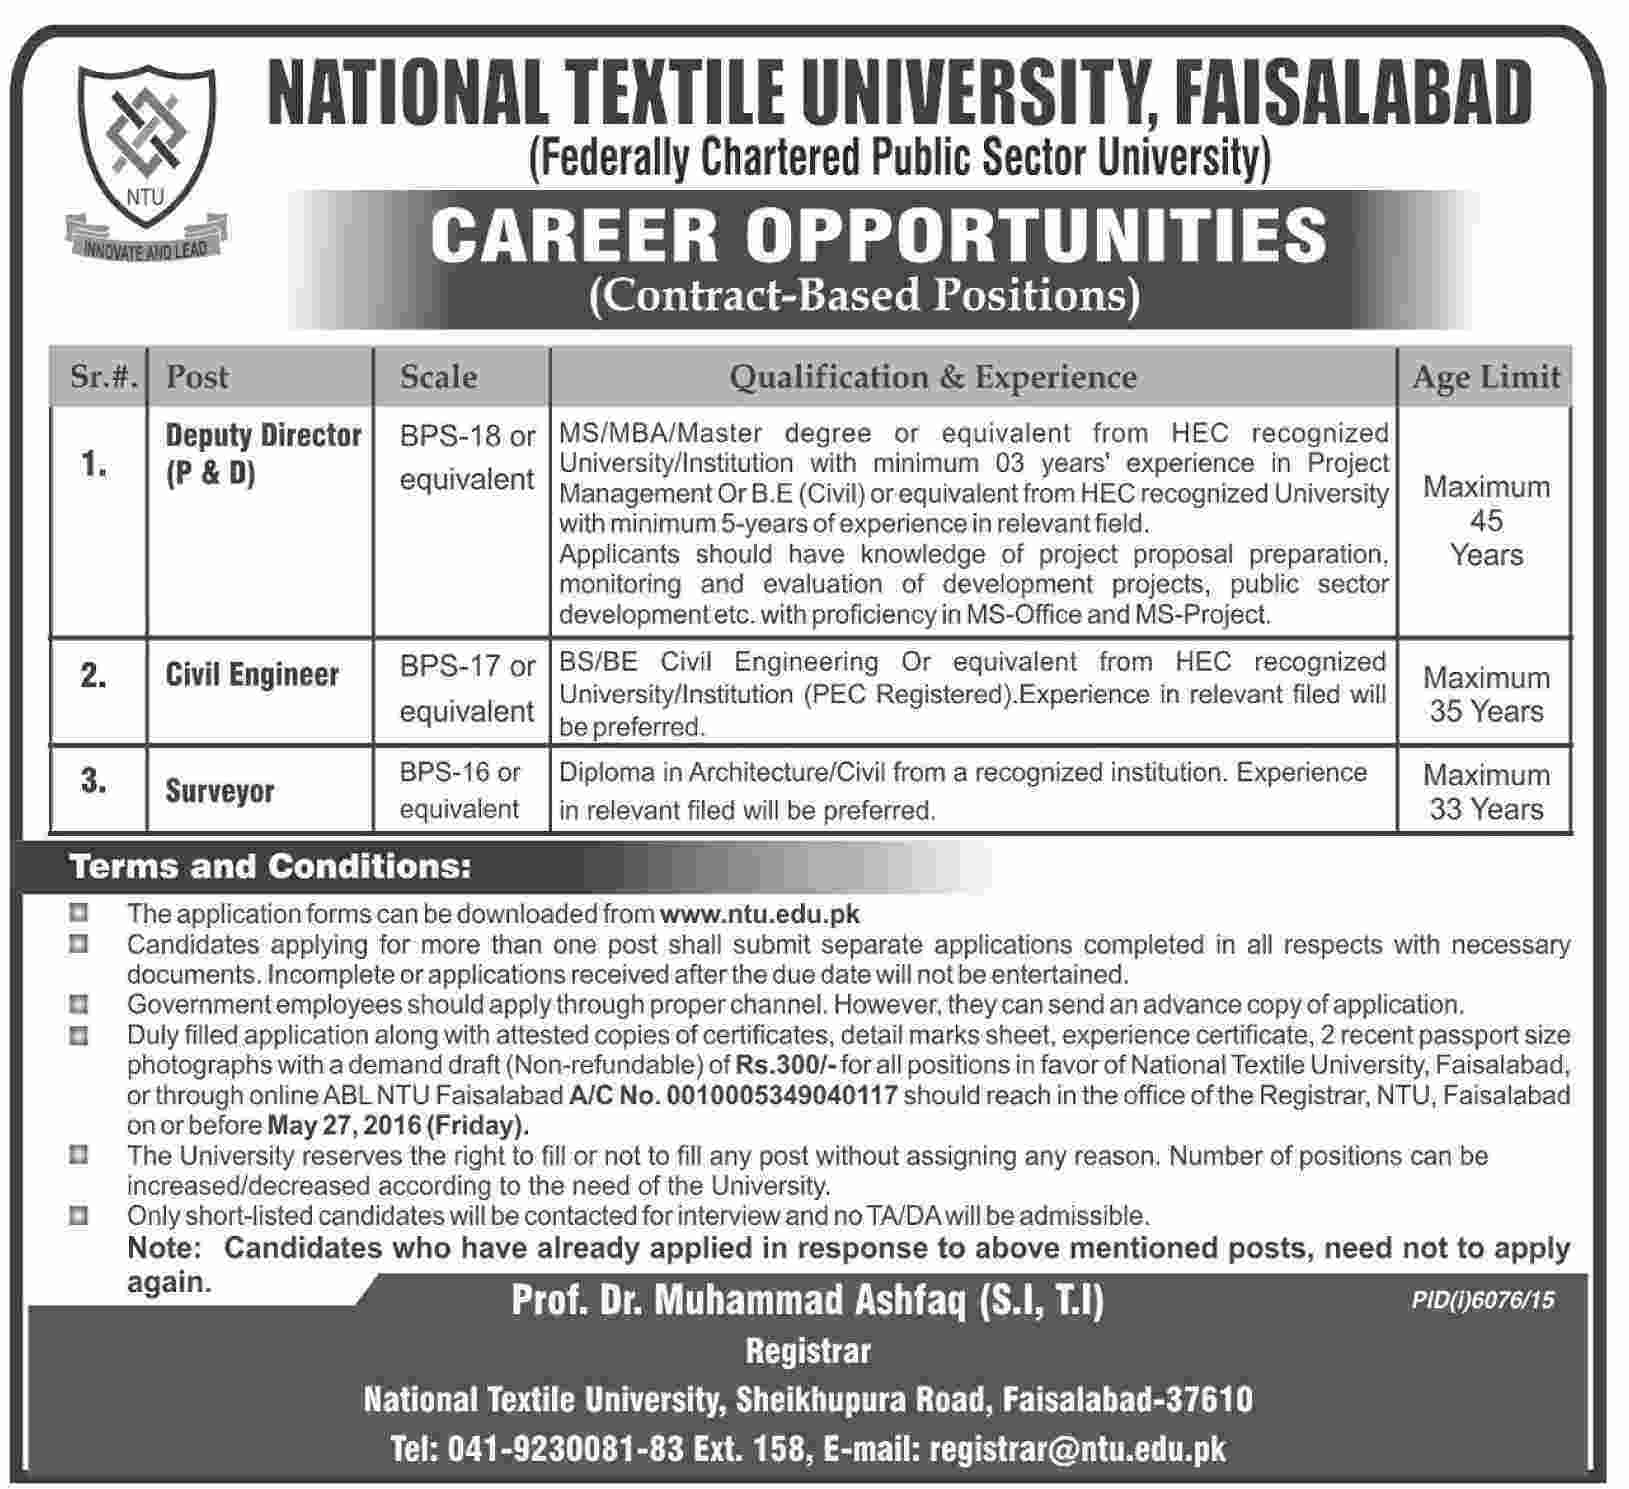 National Textile University Faislabad Jobs 2016